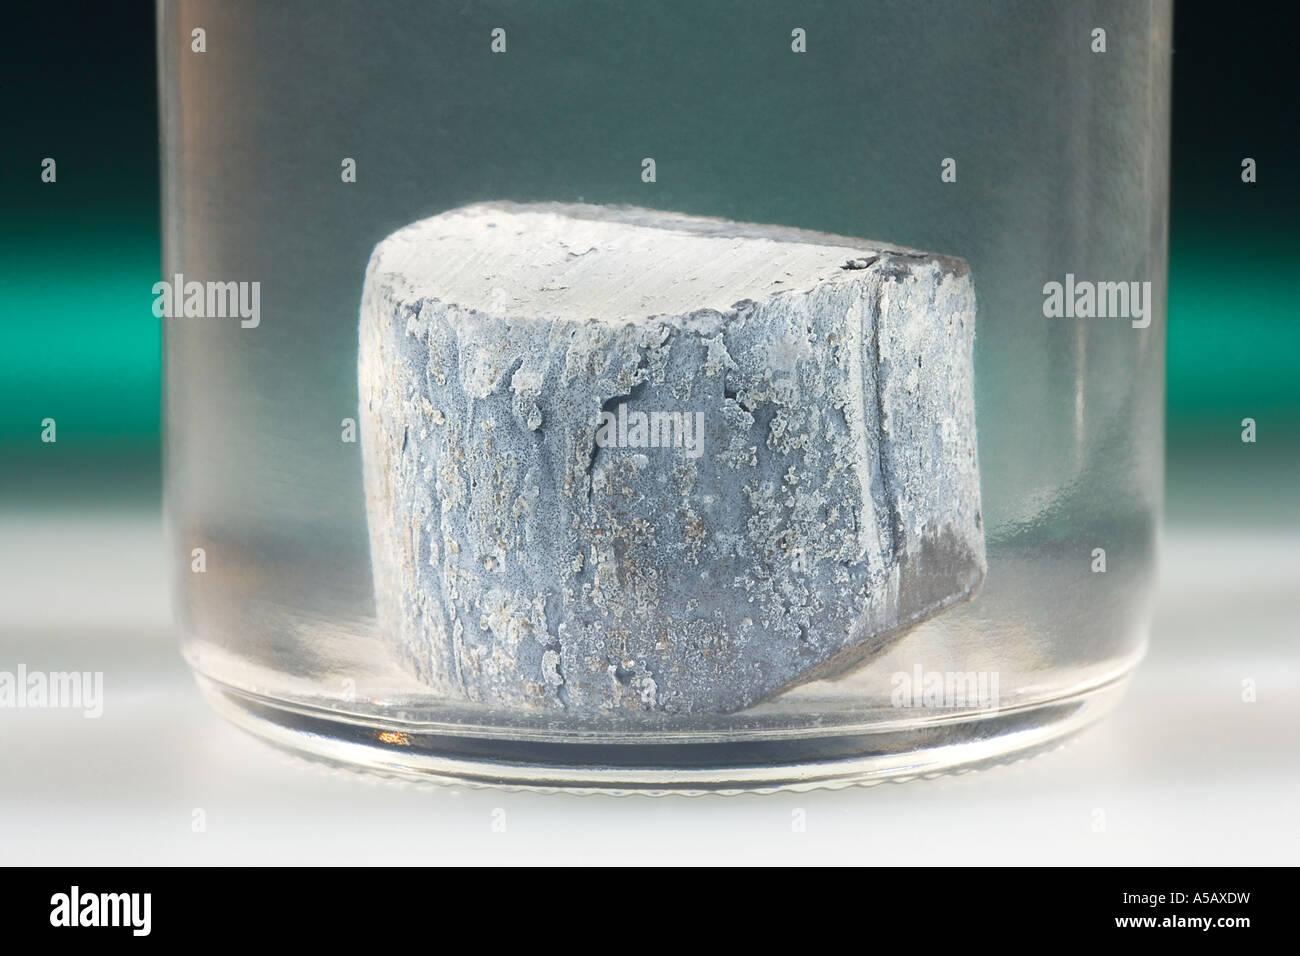 Elemental Barium in Mineral Oil - Stock Image